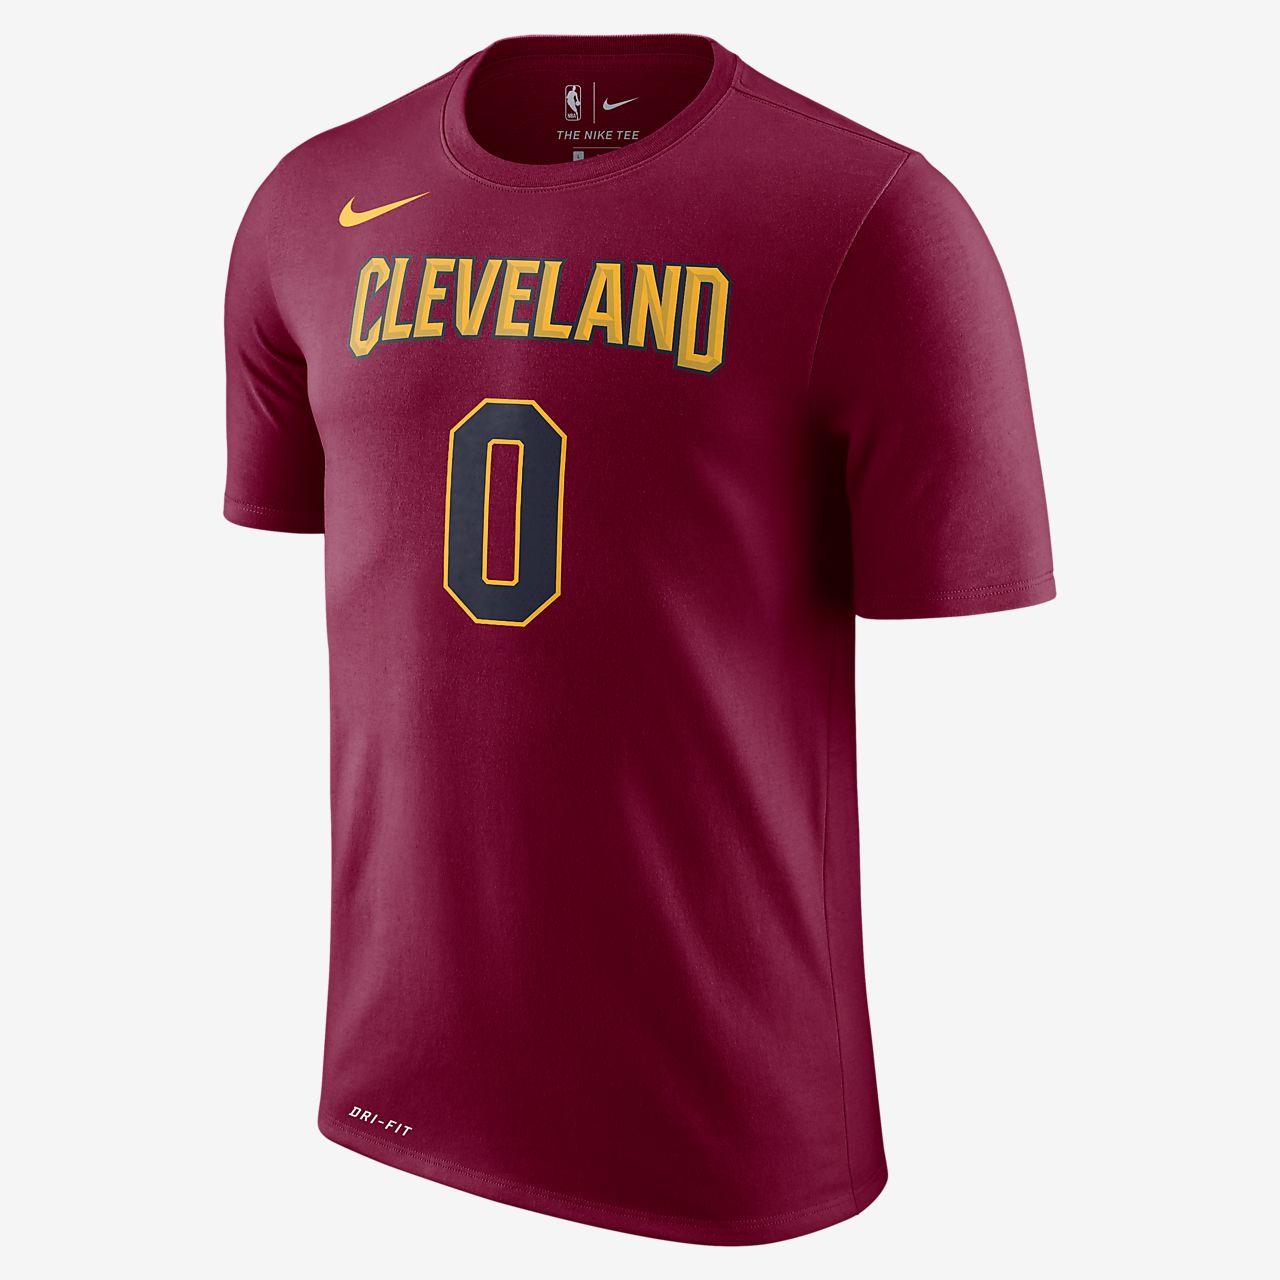 6d1d199b95d Kevin Love Cleveland Cavaliers Nike Dri-FIT Men s NBA T-Shirt. Nike.com